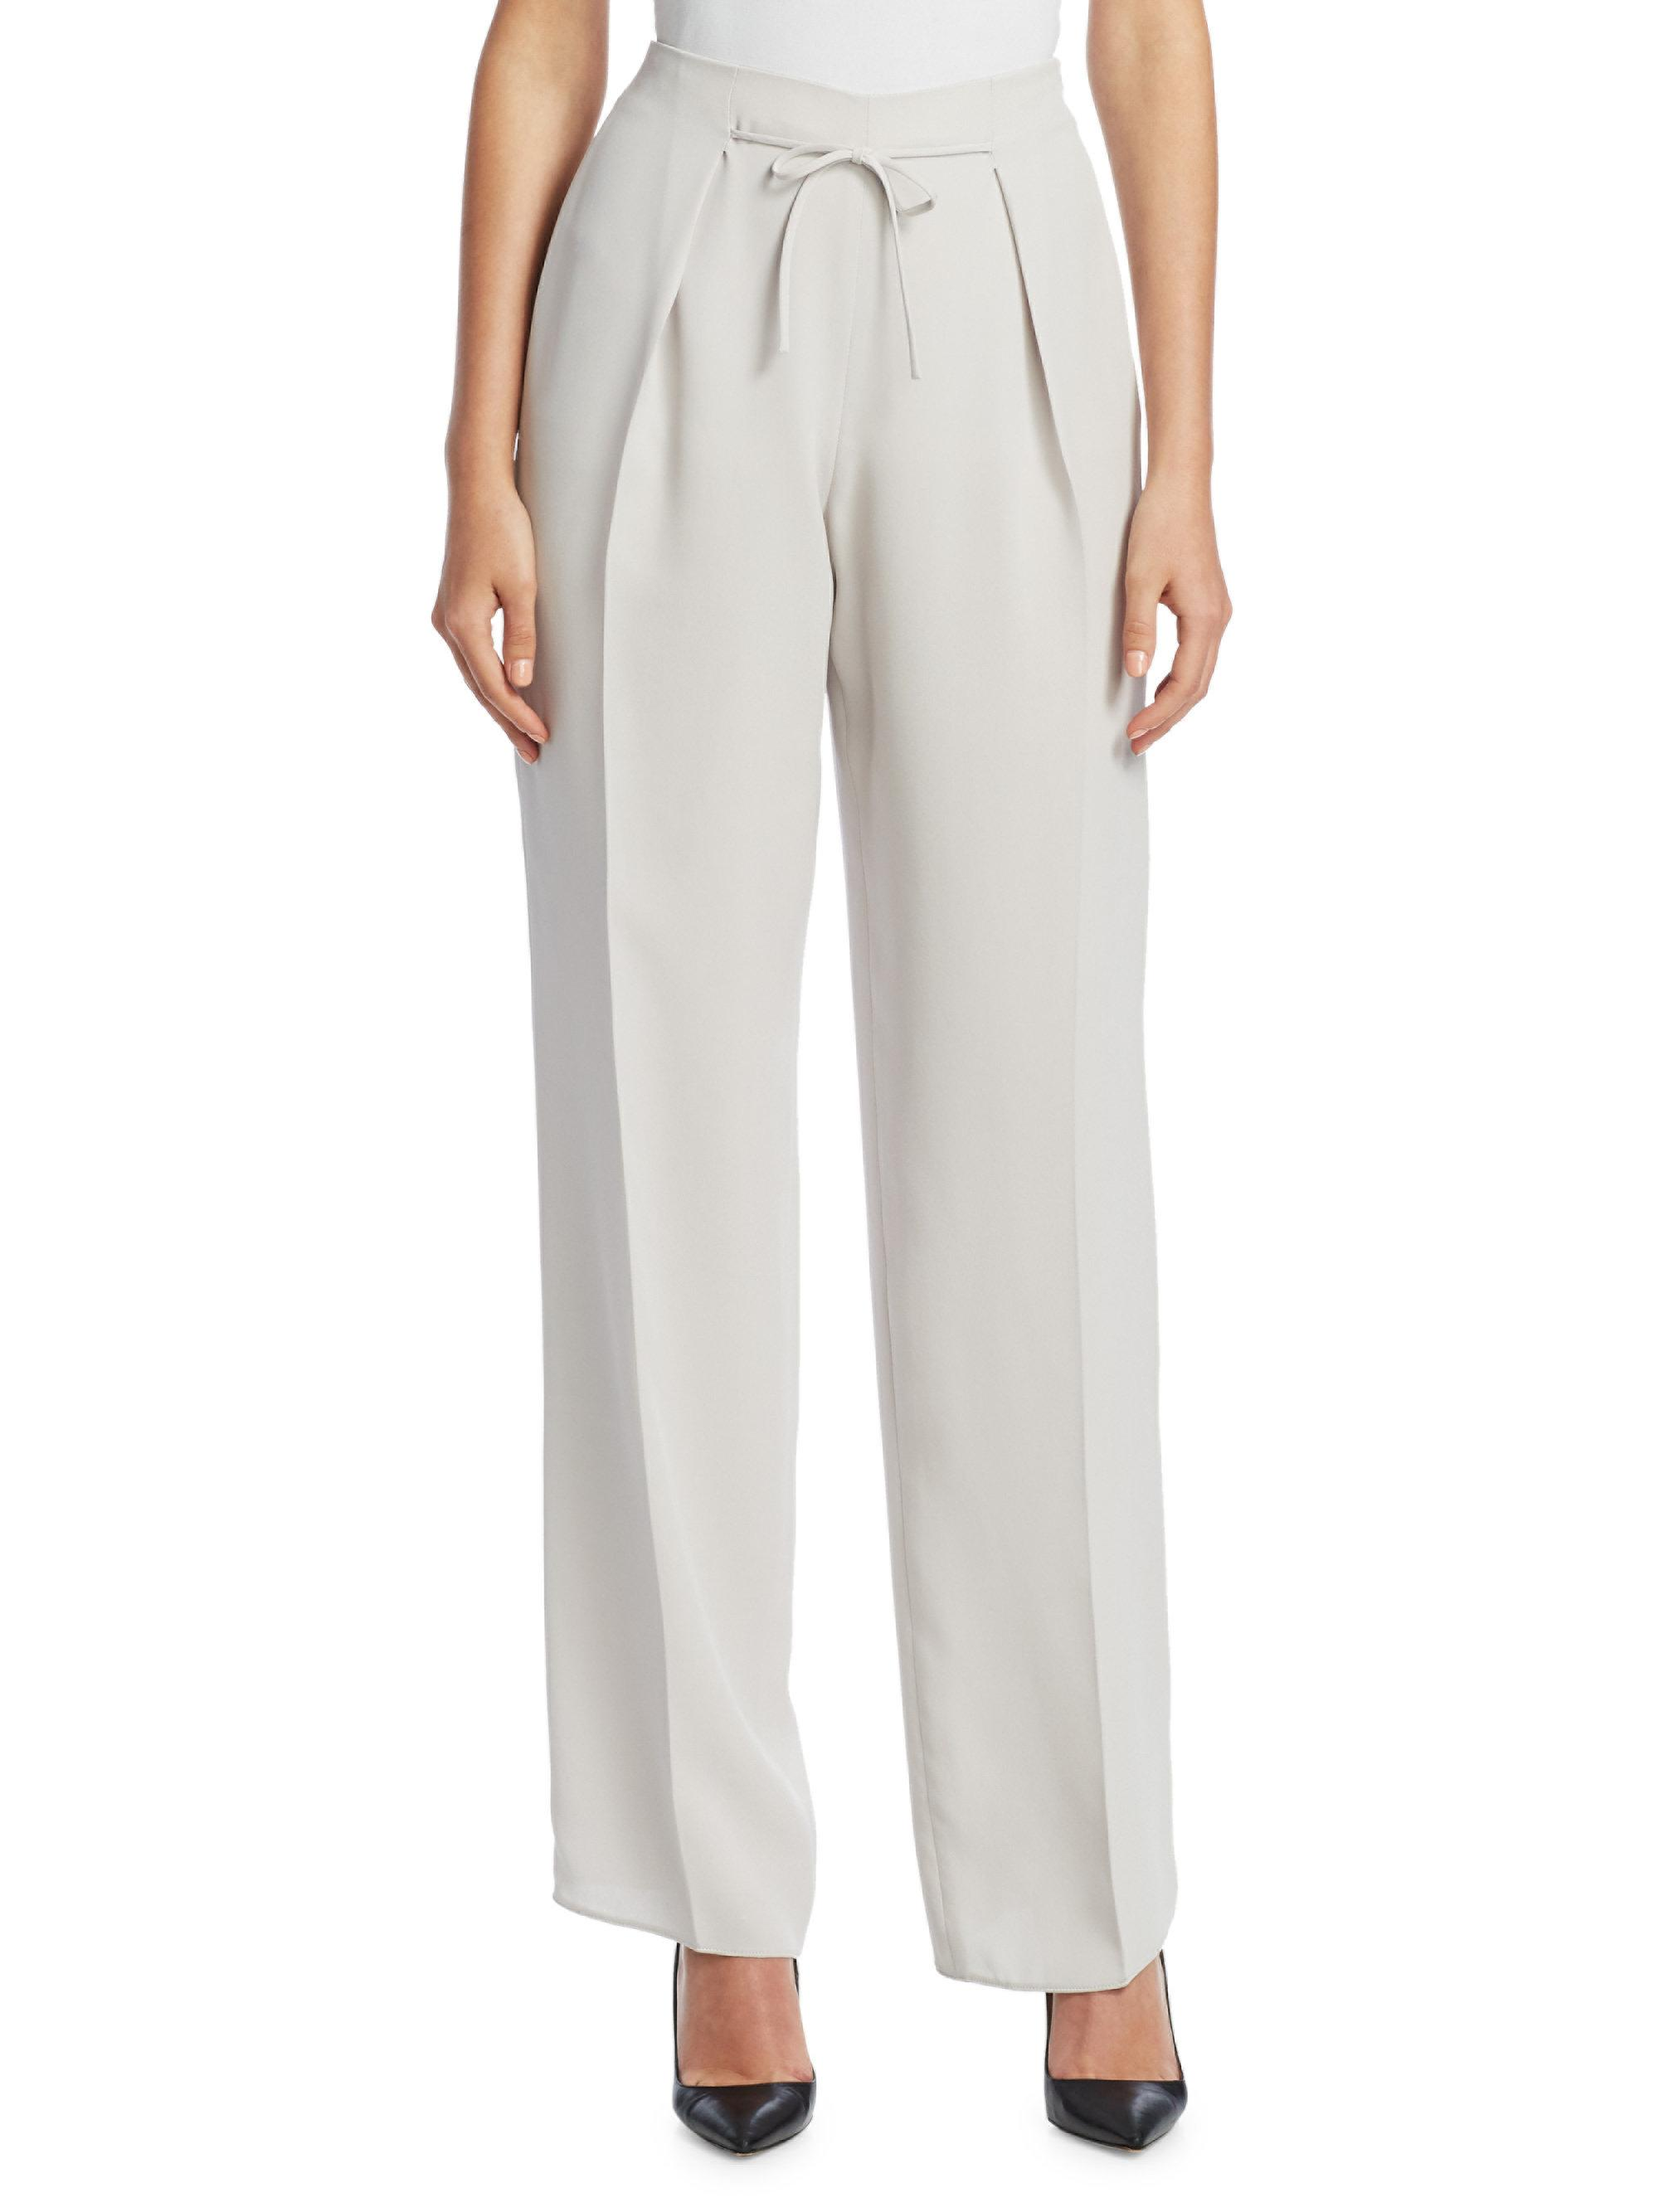 TROUSERS - 3/4-length trousers Emporio Armani iJl5fXKg